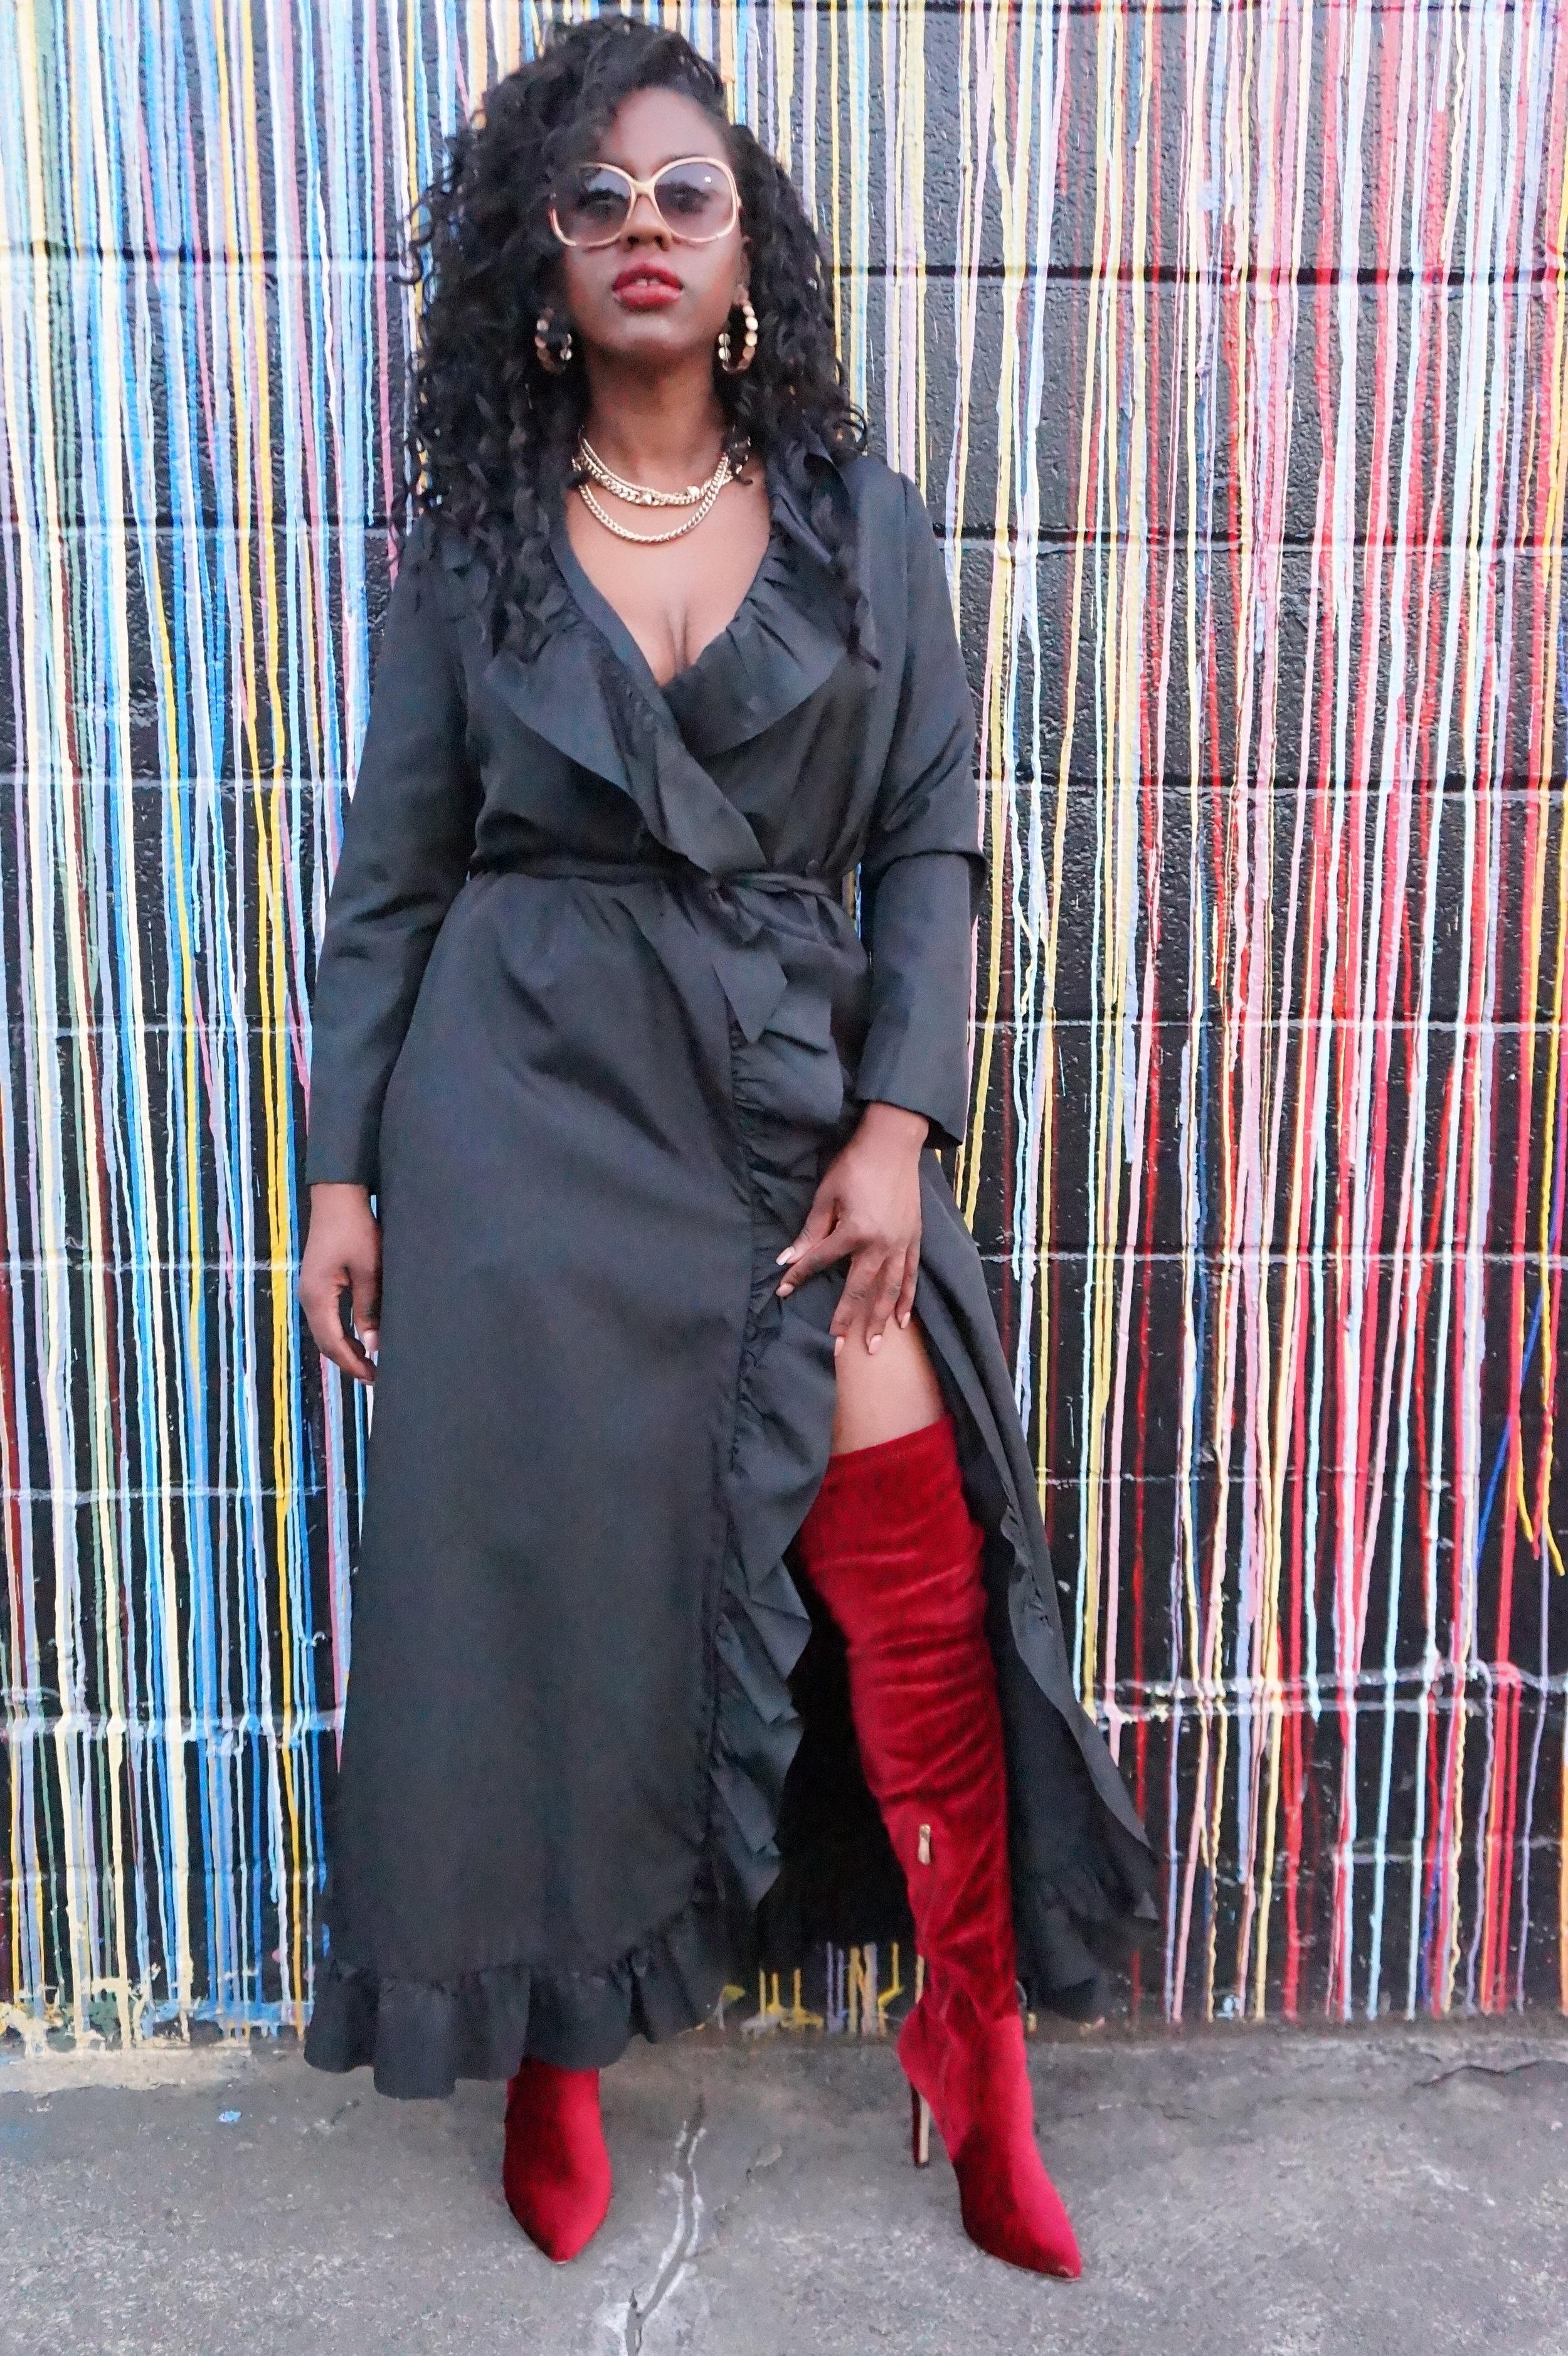 Andrea Fenise Memphis Fashion Blogger shots cover story for The Memphis Flyer